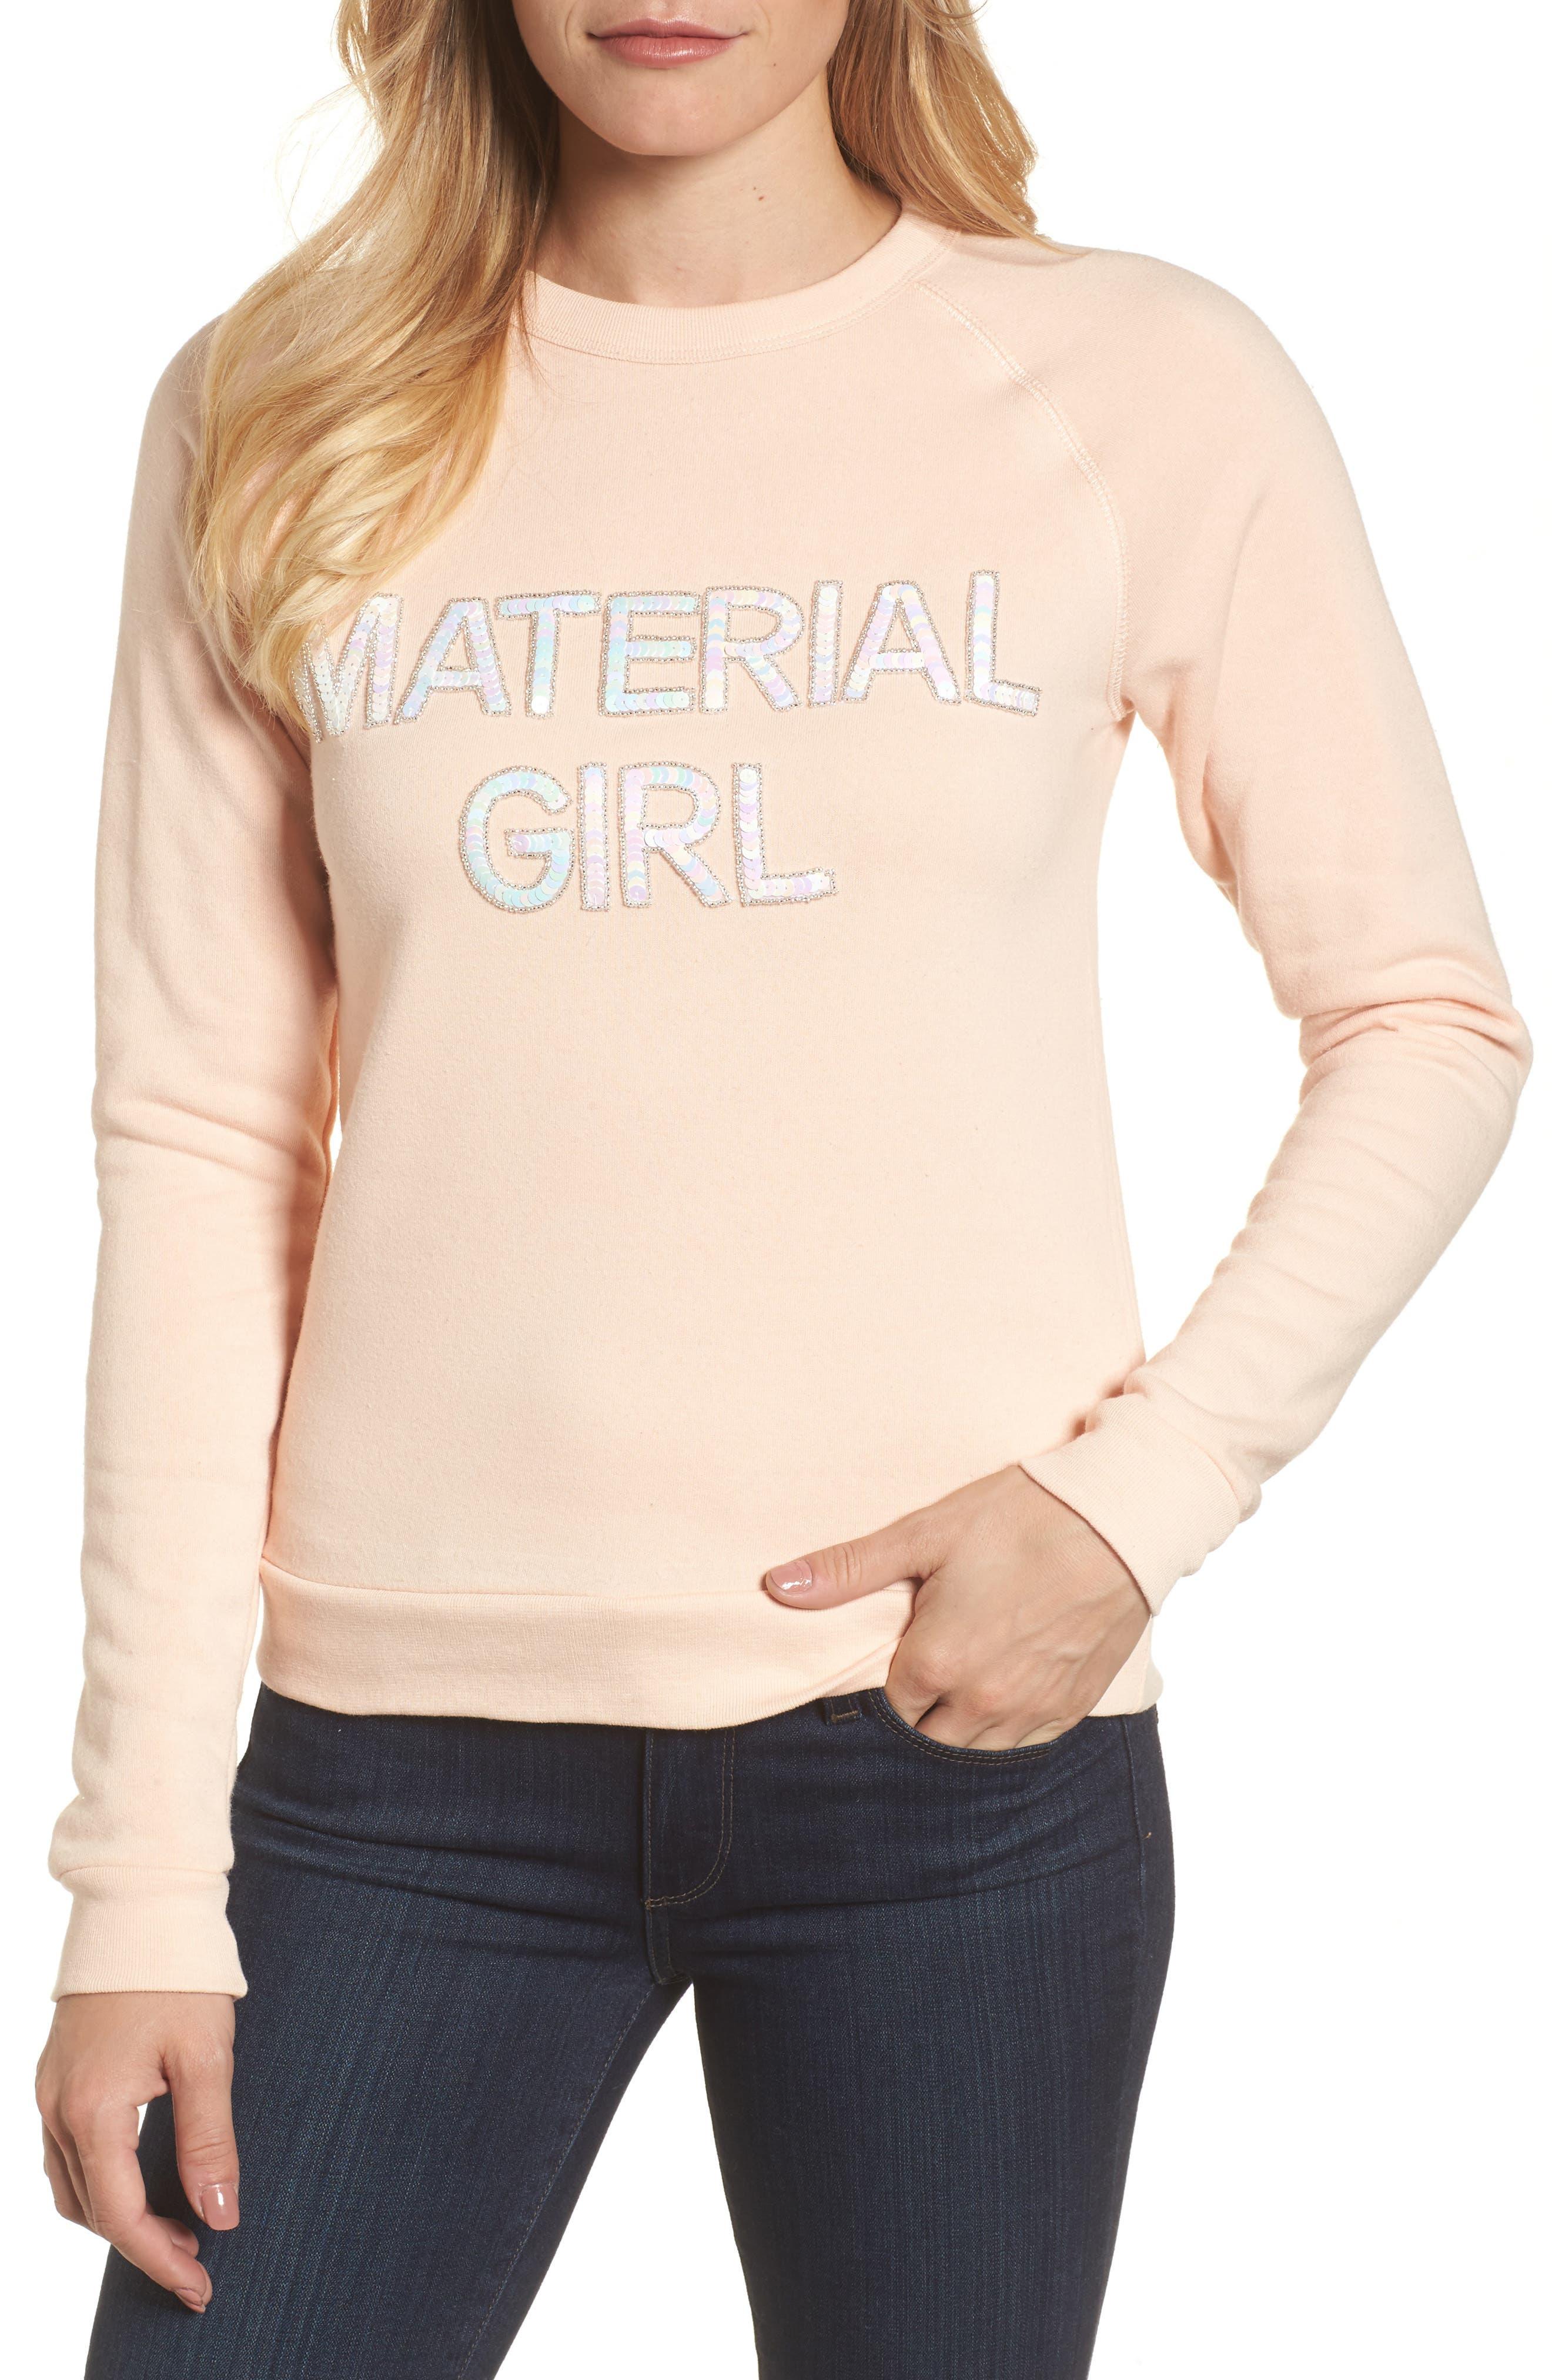 Bow & Drape Material Girl Sweatshirt